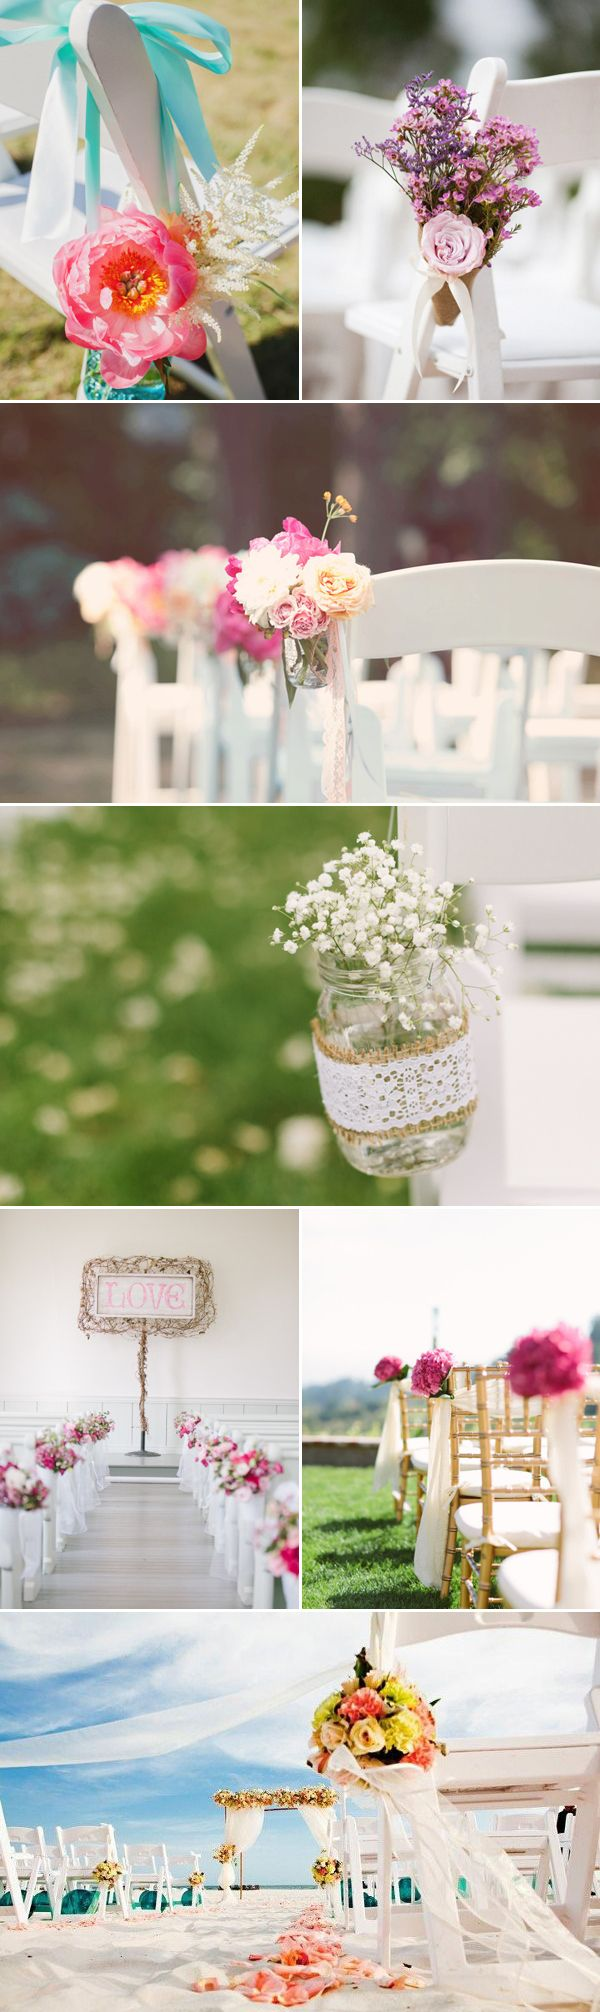 Farm wedding decor ideas   Styling Horseshoe Ideas For A Rustic Farm Wedding  Aisle markers